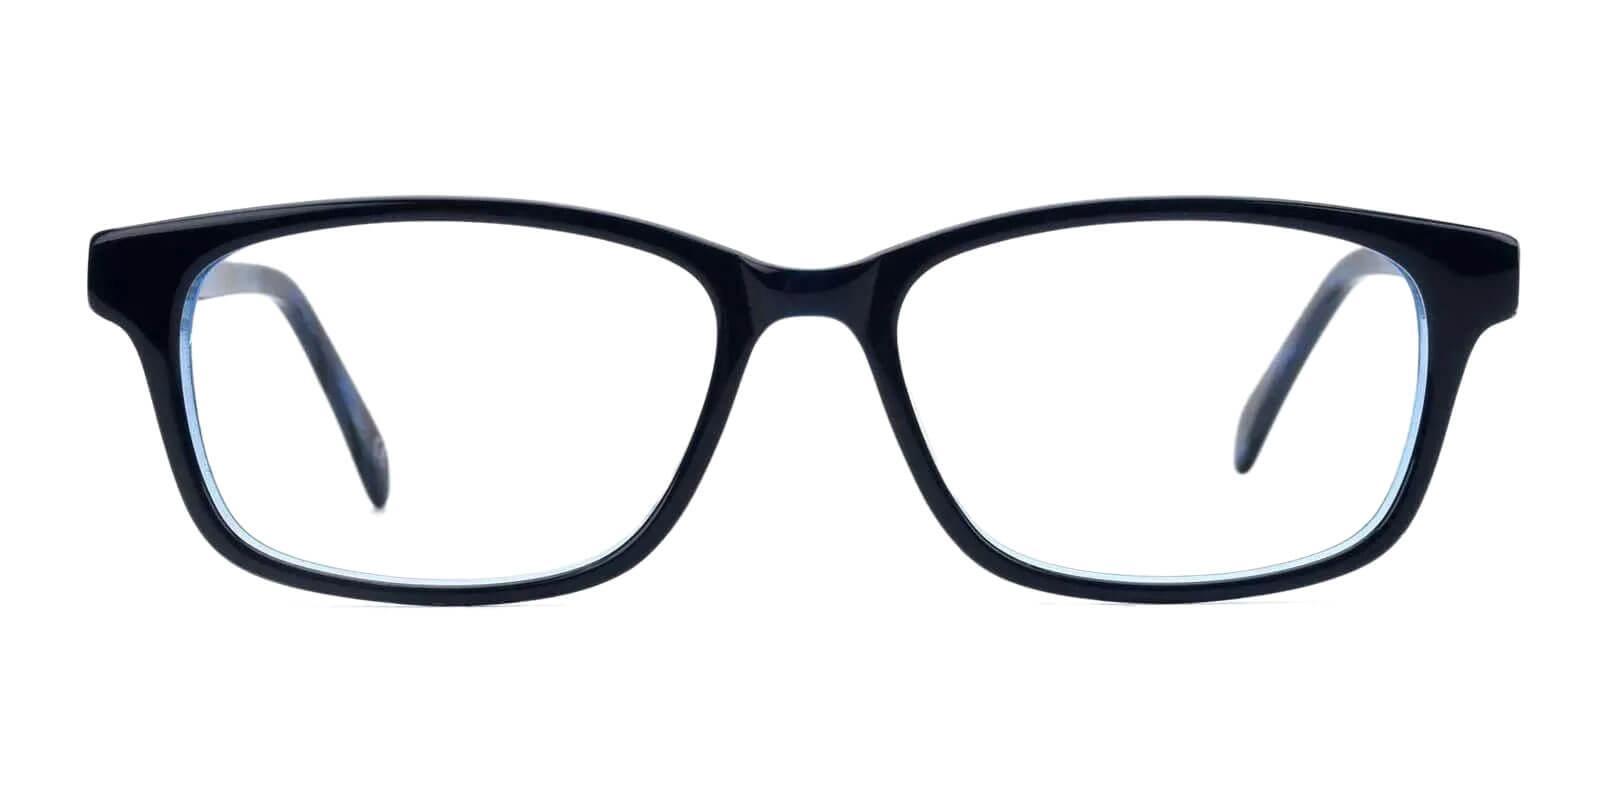 Emmi Blue Acetate Eyeglasses , Fashion , UniversalBridgeFit Frames from ABBE Glasses